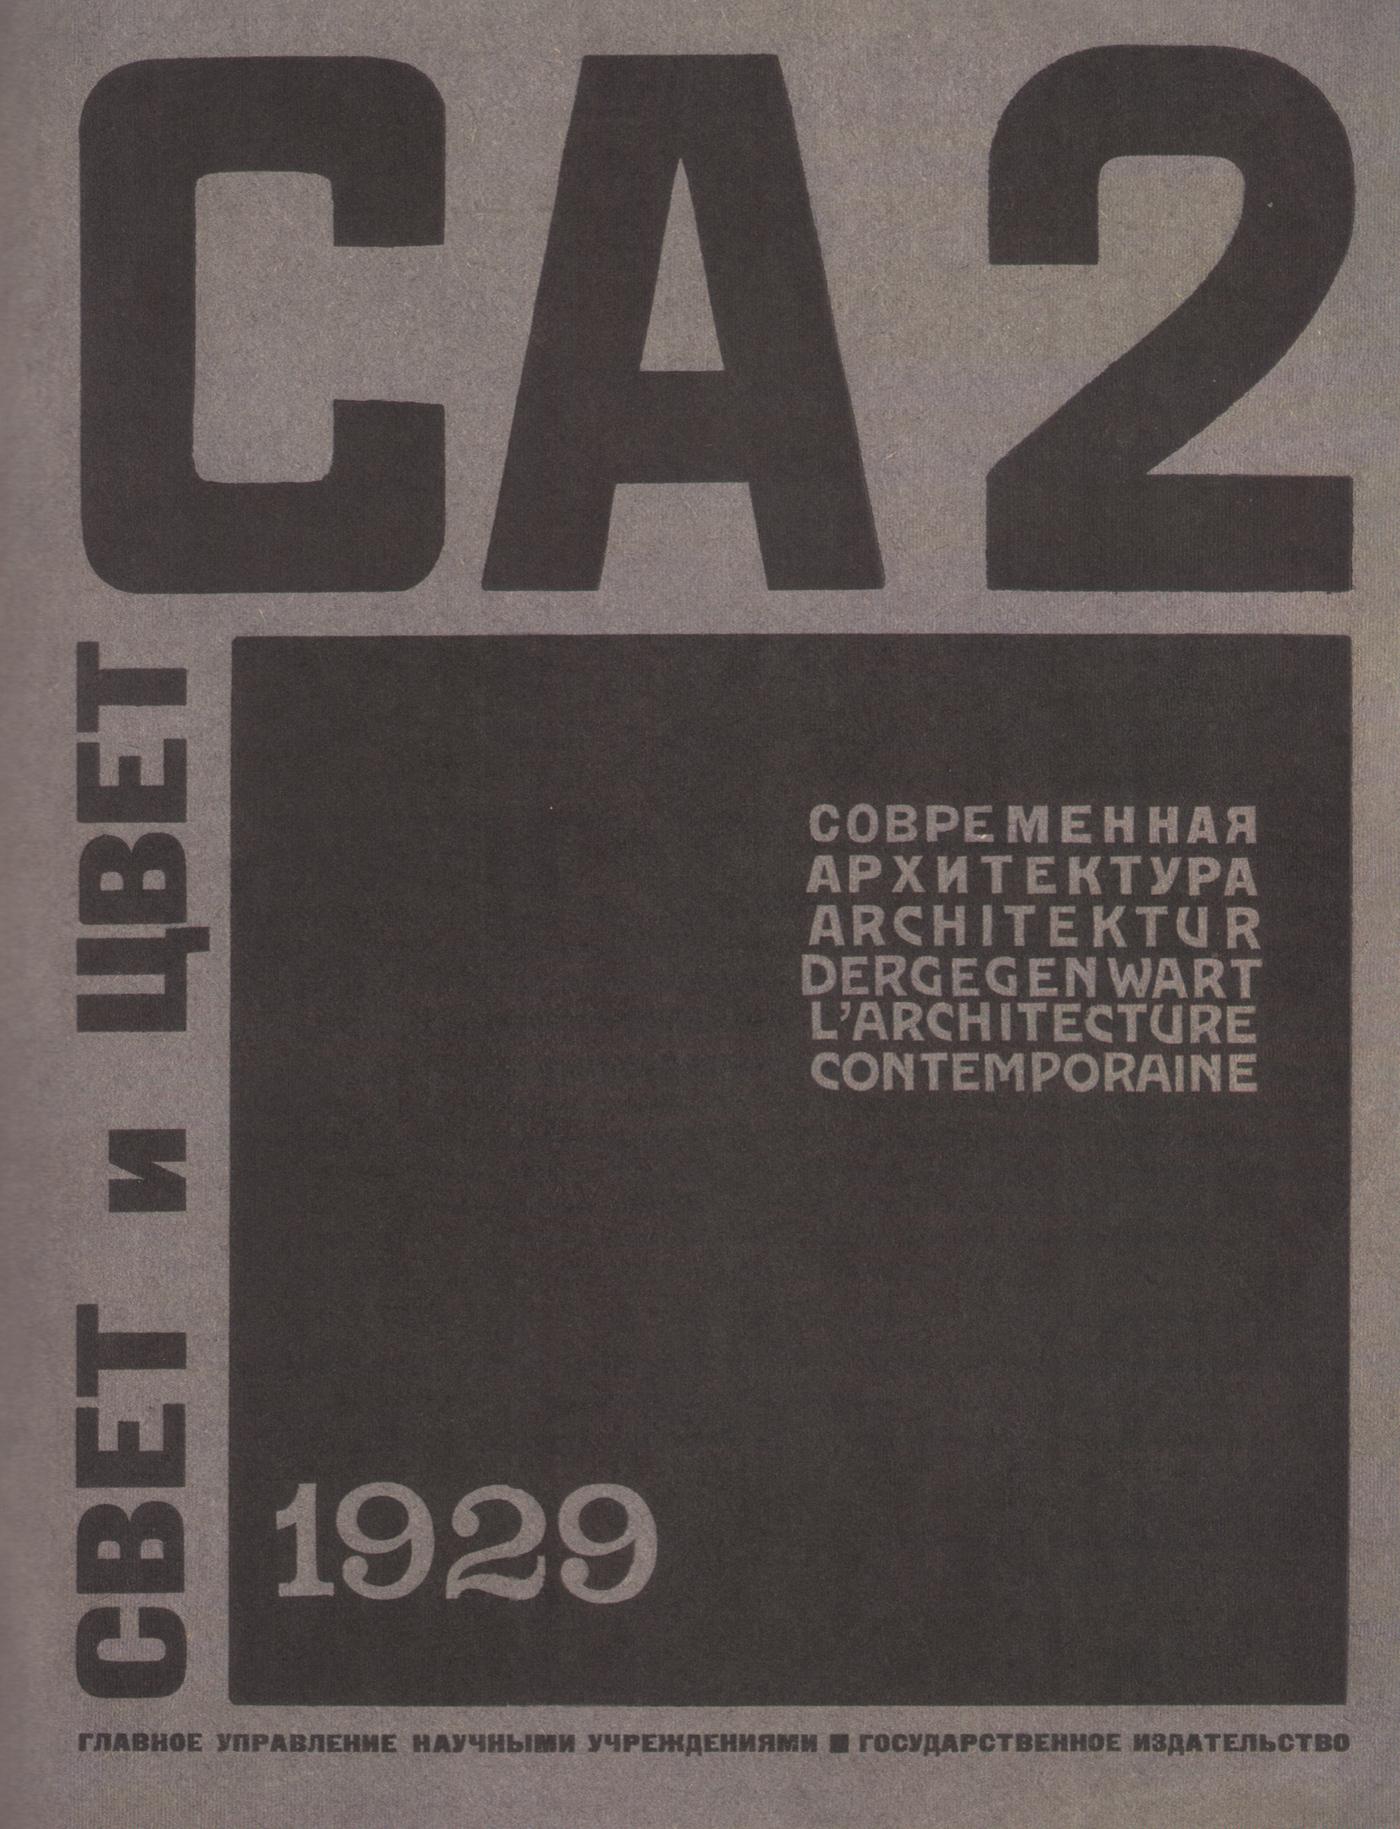 Современная архитектура: 1926—1930 : Журнал / Сост. Э. Кубенский. — М.: Tatlin Publishers, 2010